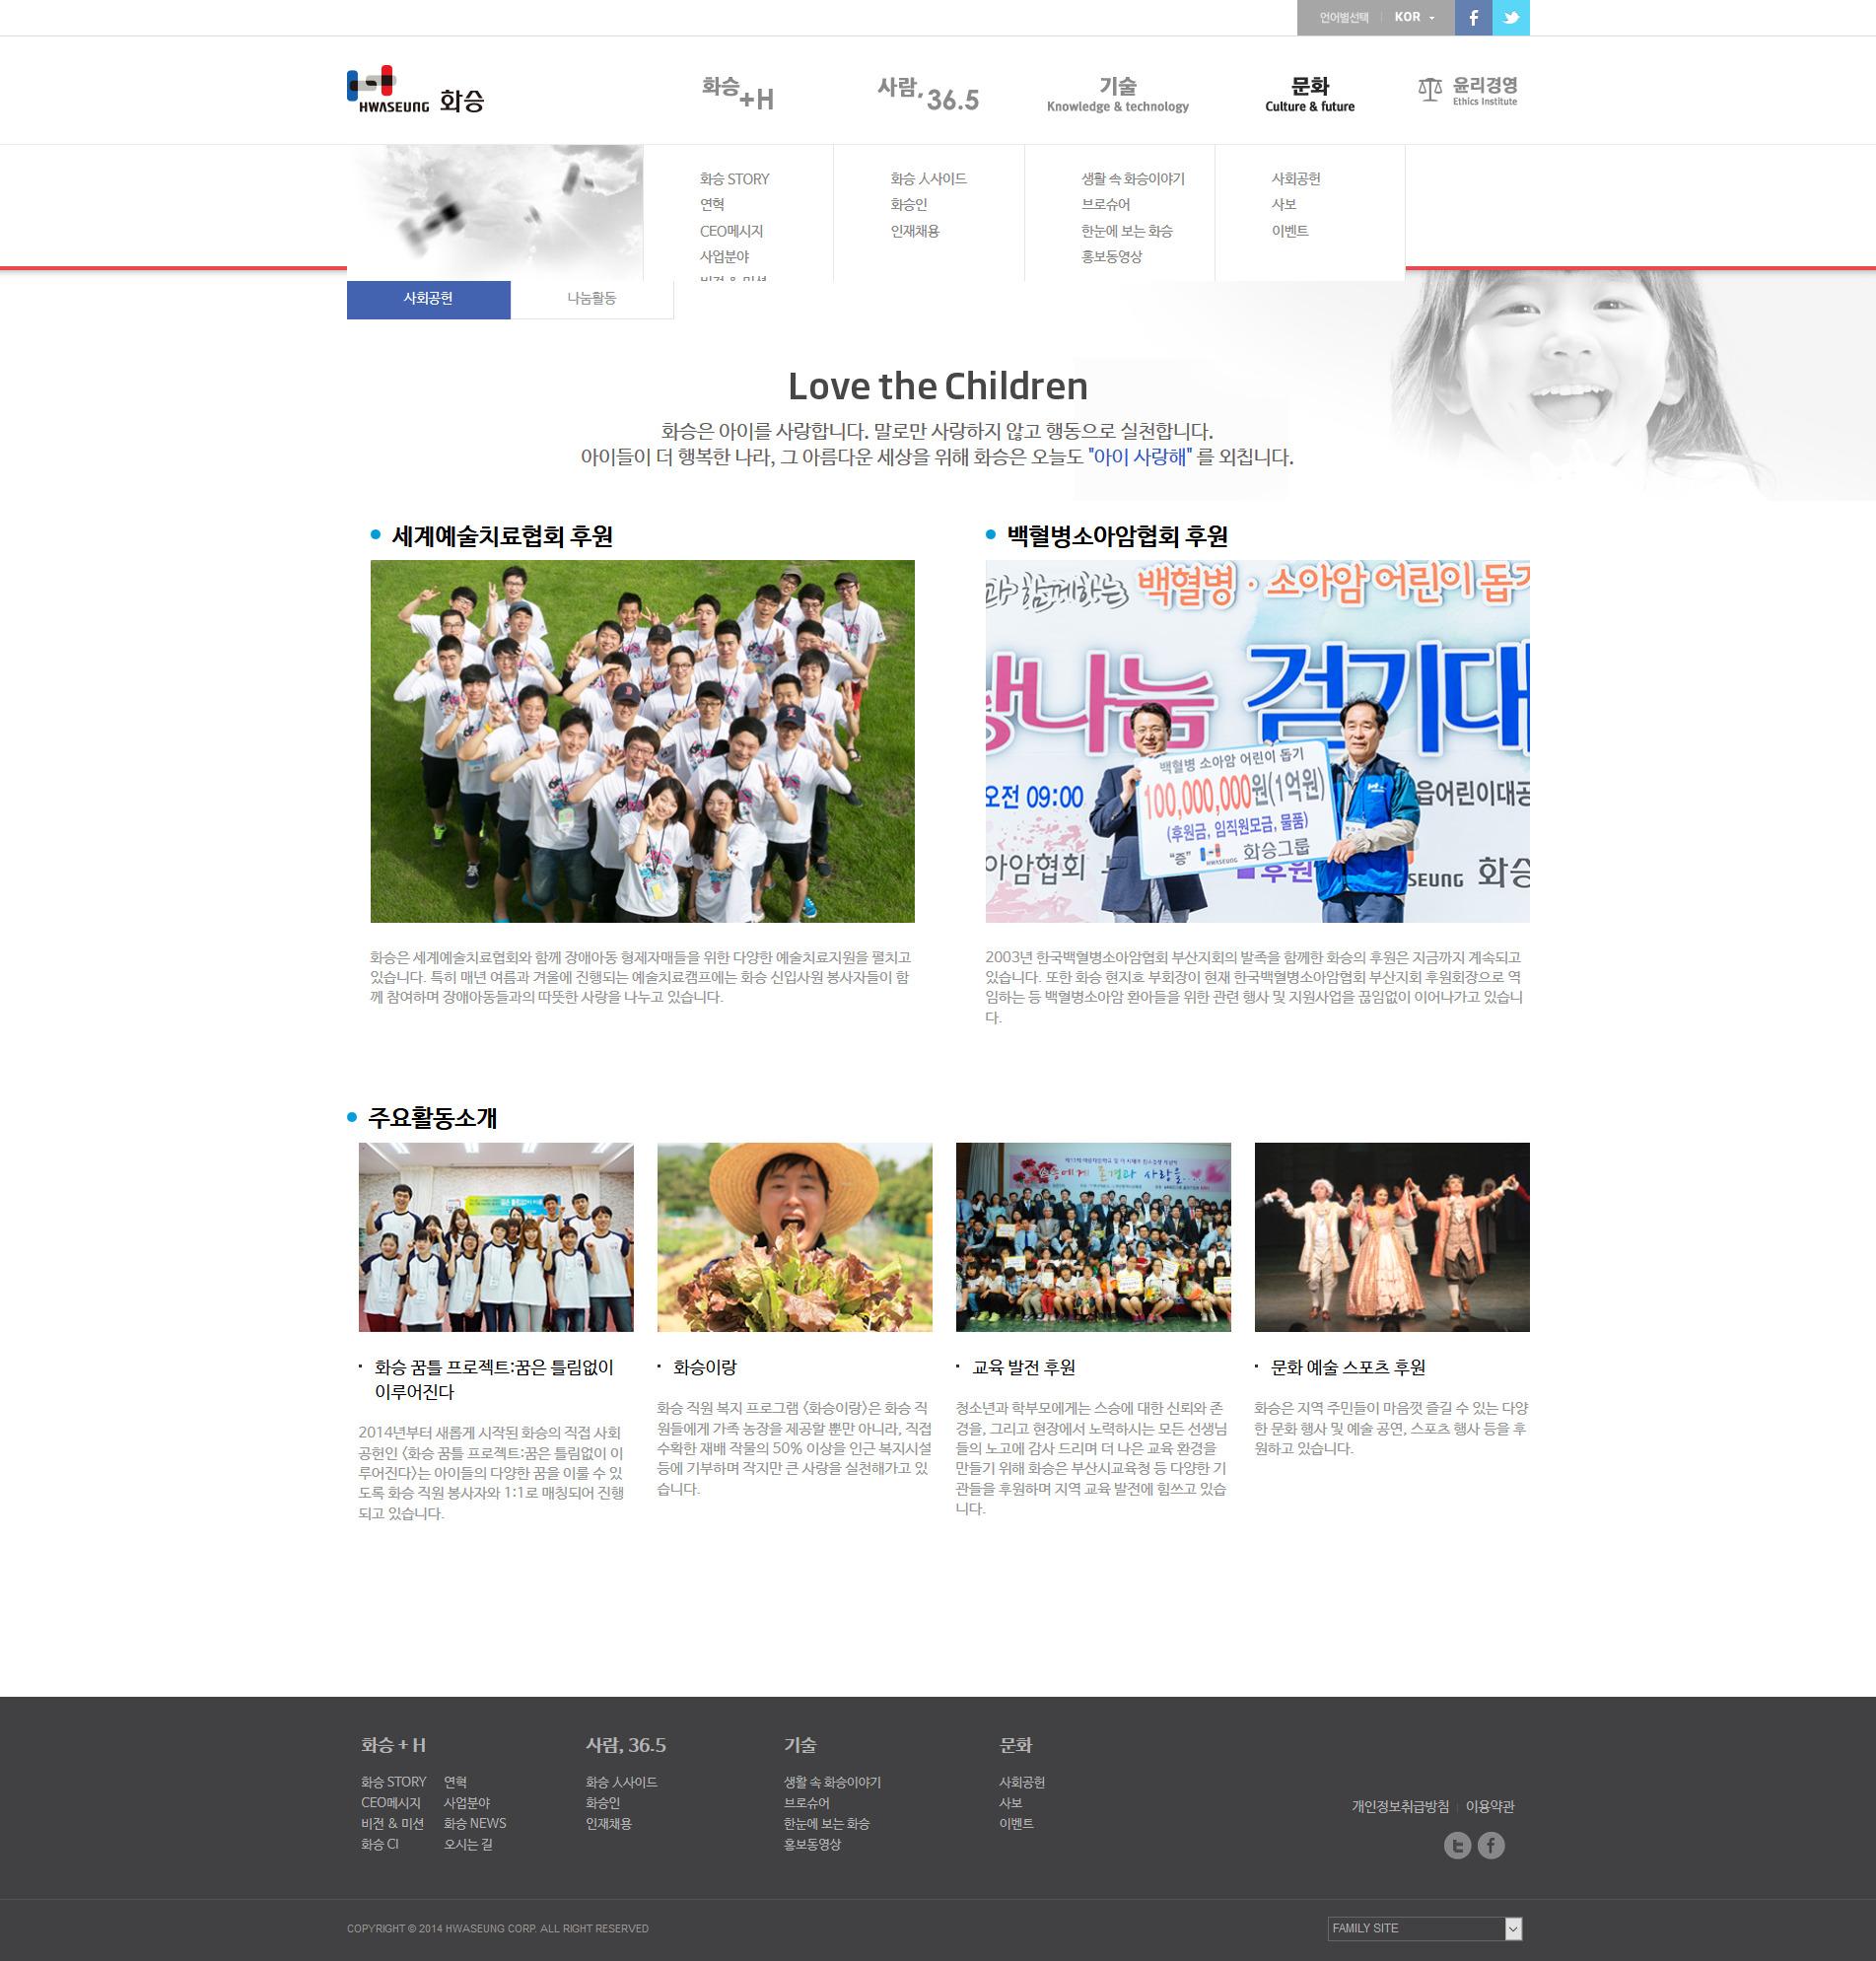 Screenshot-2018-1-4 사회공헌 문화 Culture Future 화승 - HWASEUNG.jpg